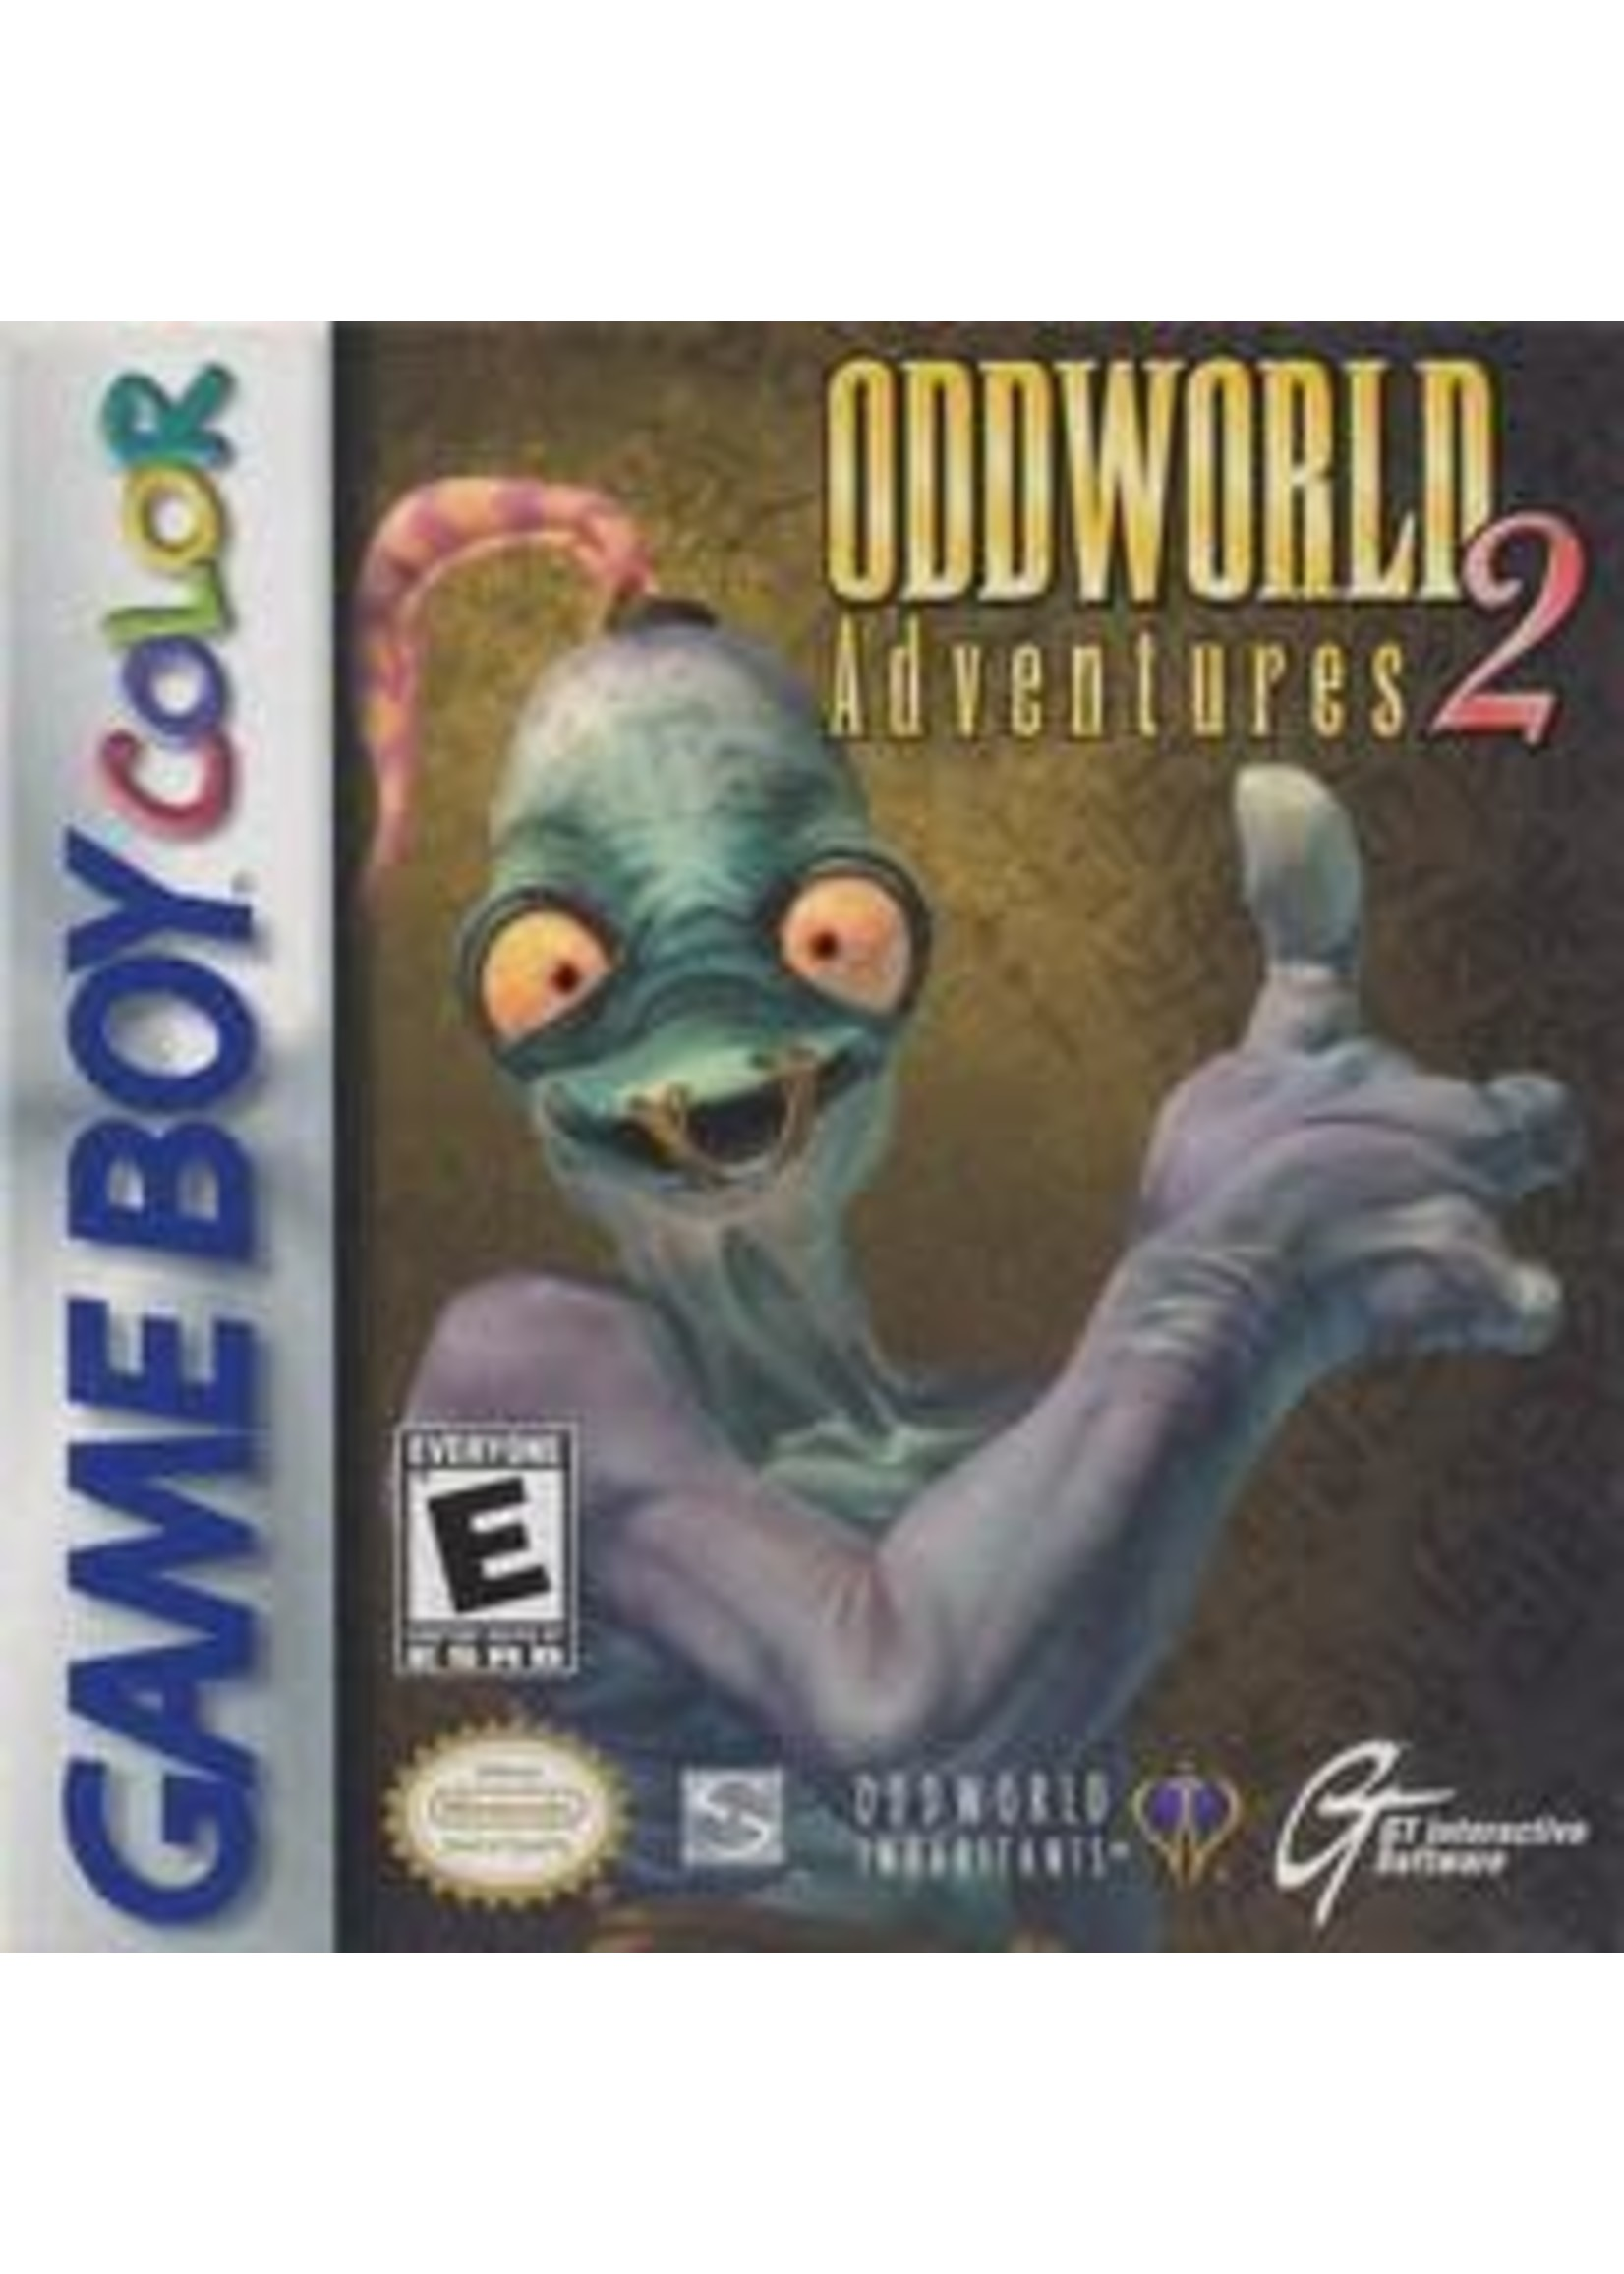 Oddworld Adventures 2 GameBoy Color